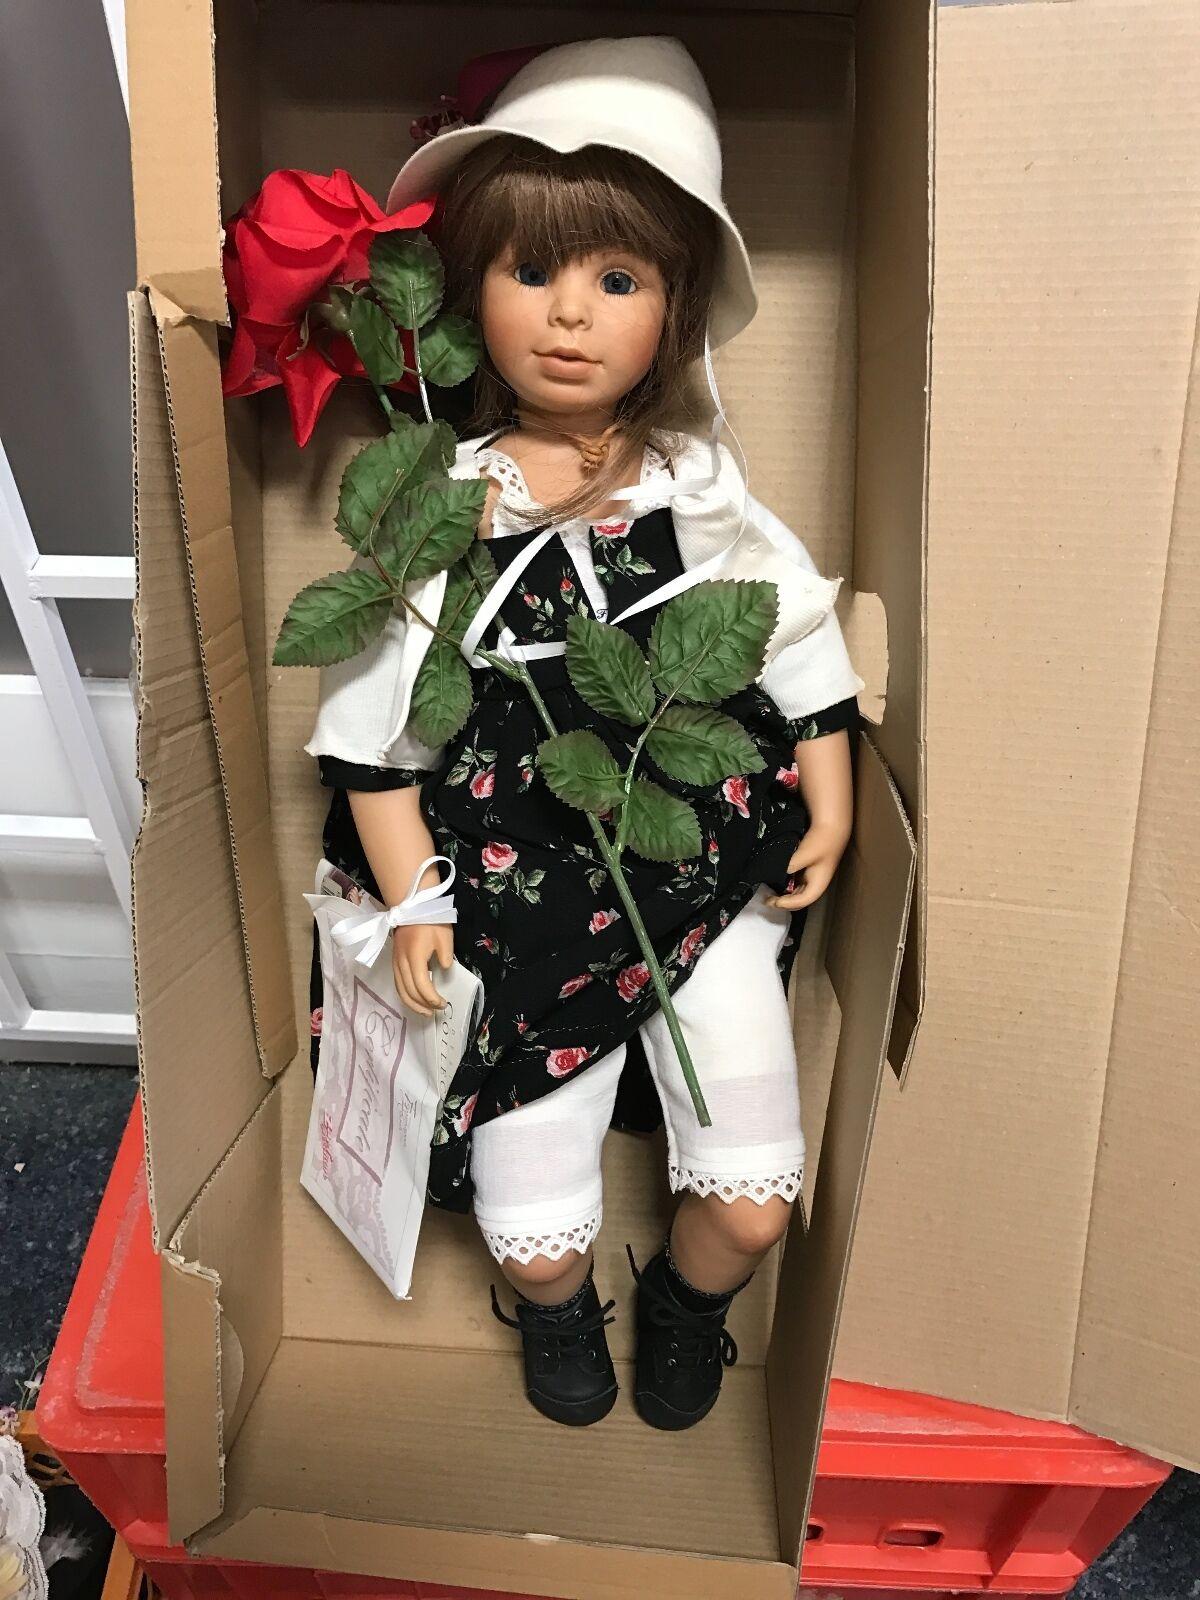 Bettina Feigenspan Vinyl Puppe Klara 62 cm. Top Zustand.